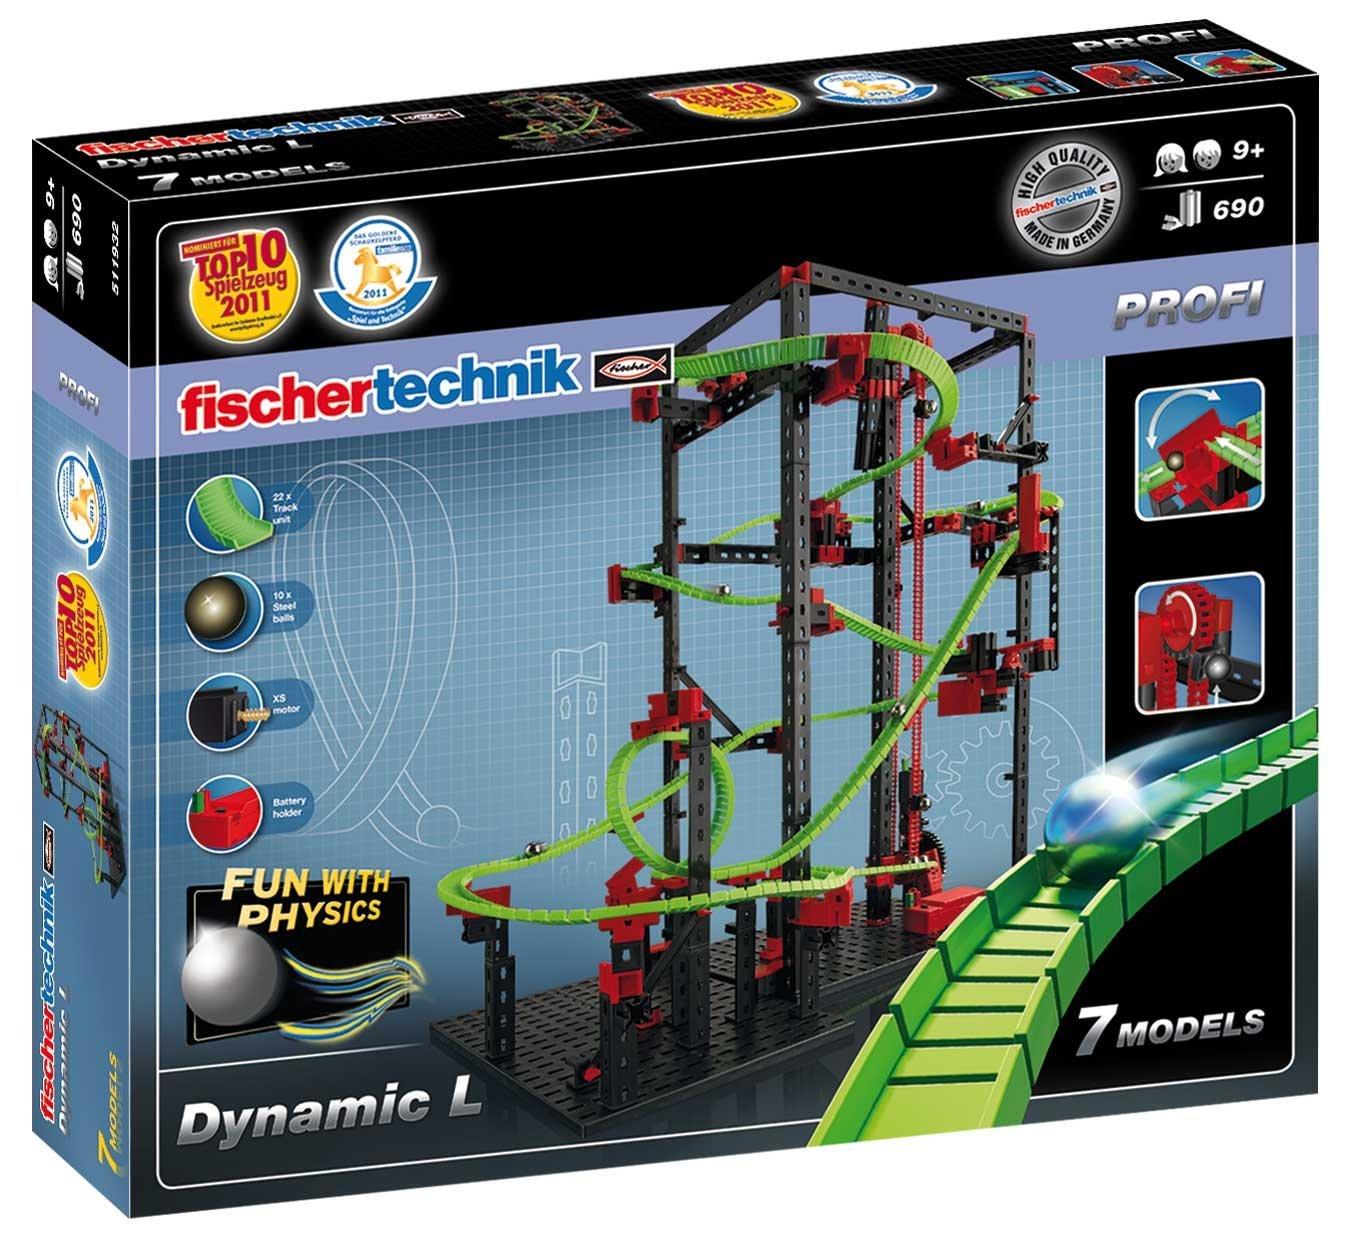 fischertechnik 511932 Dynamik L 7 Modelle 690 Bauteile